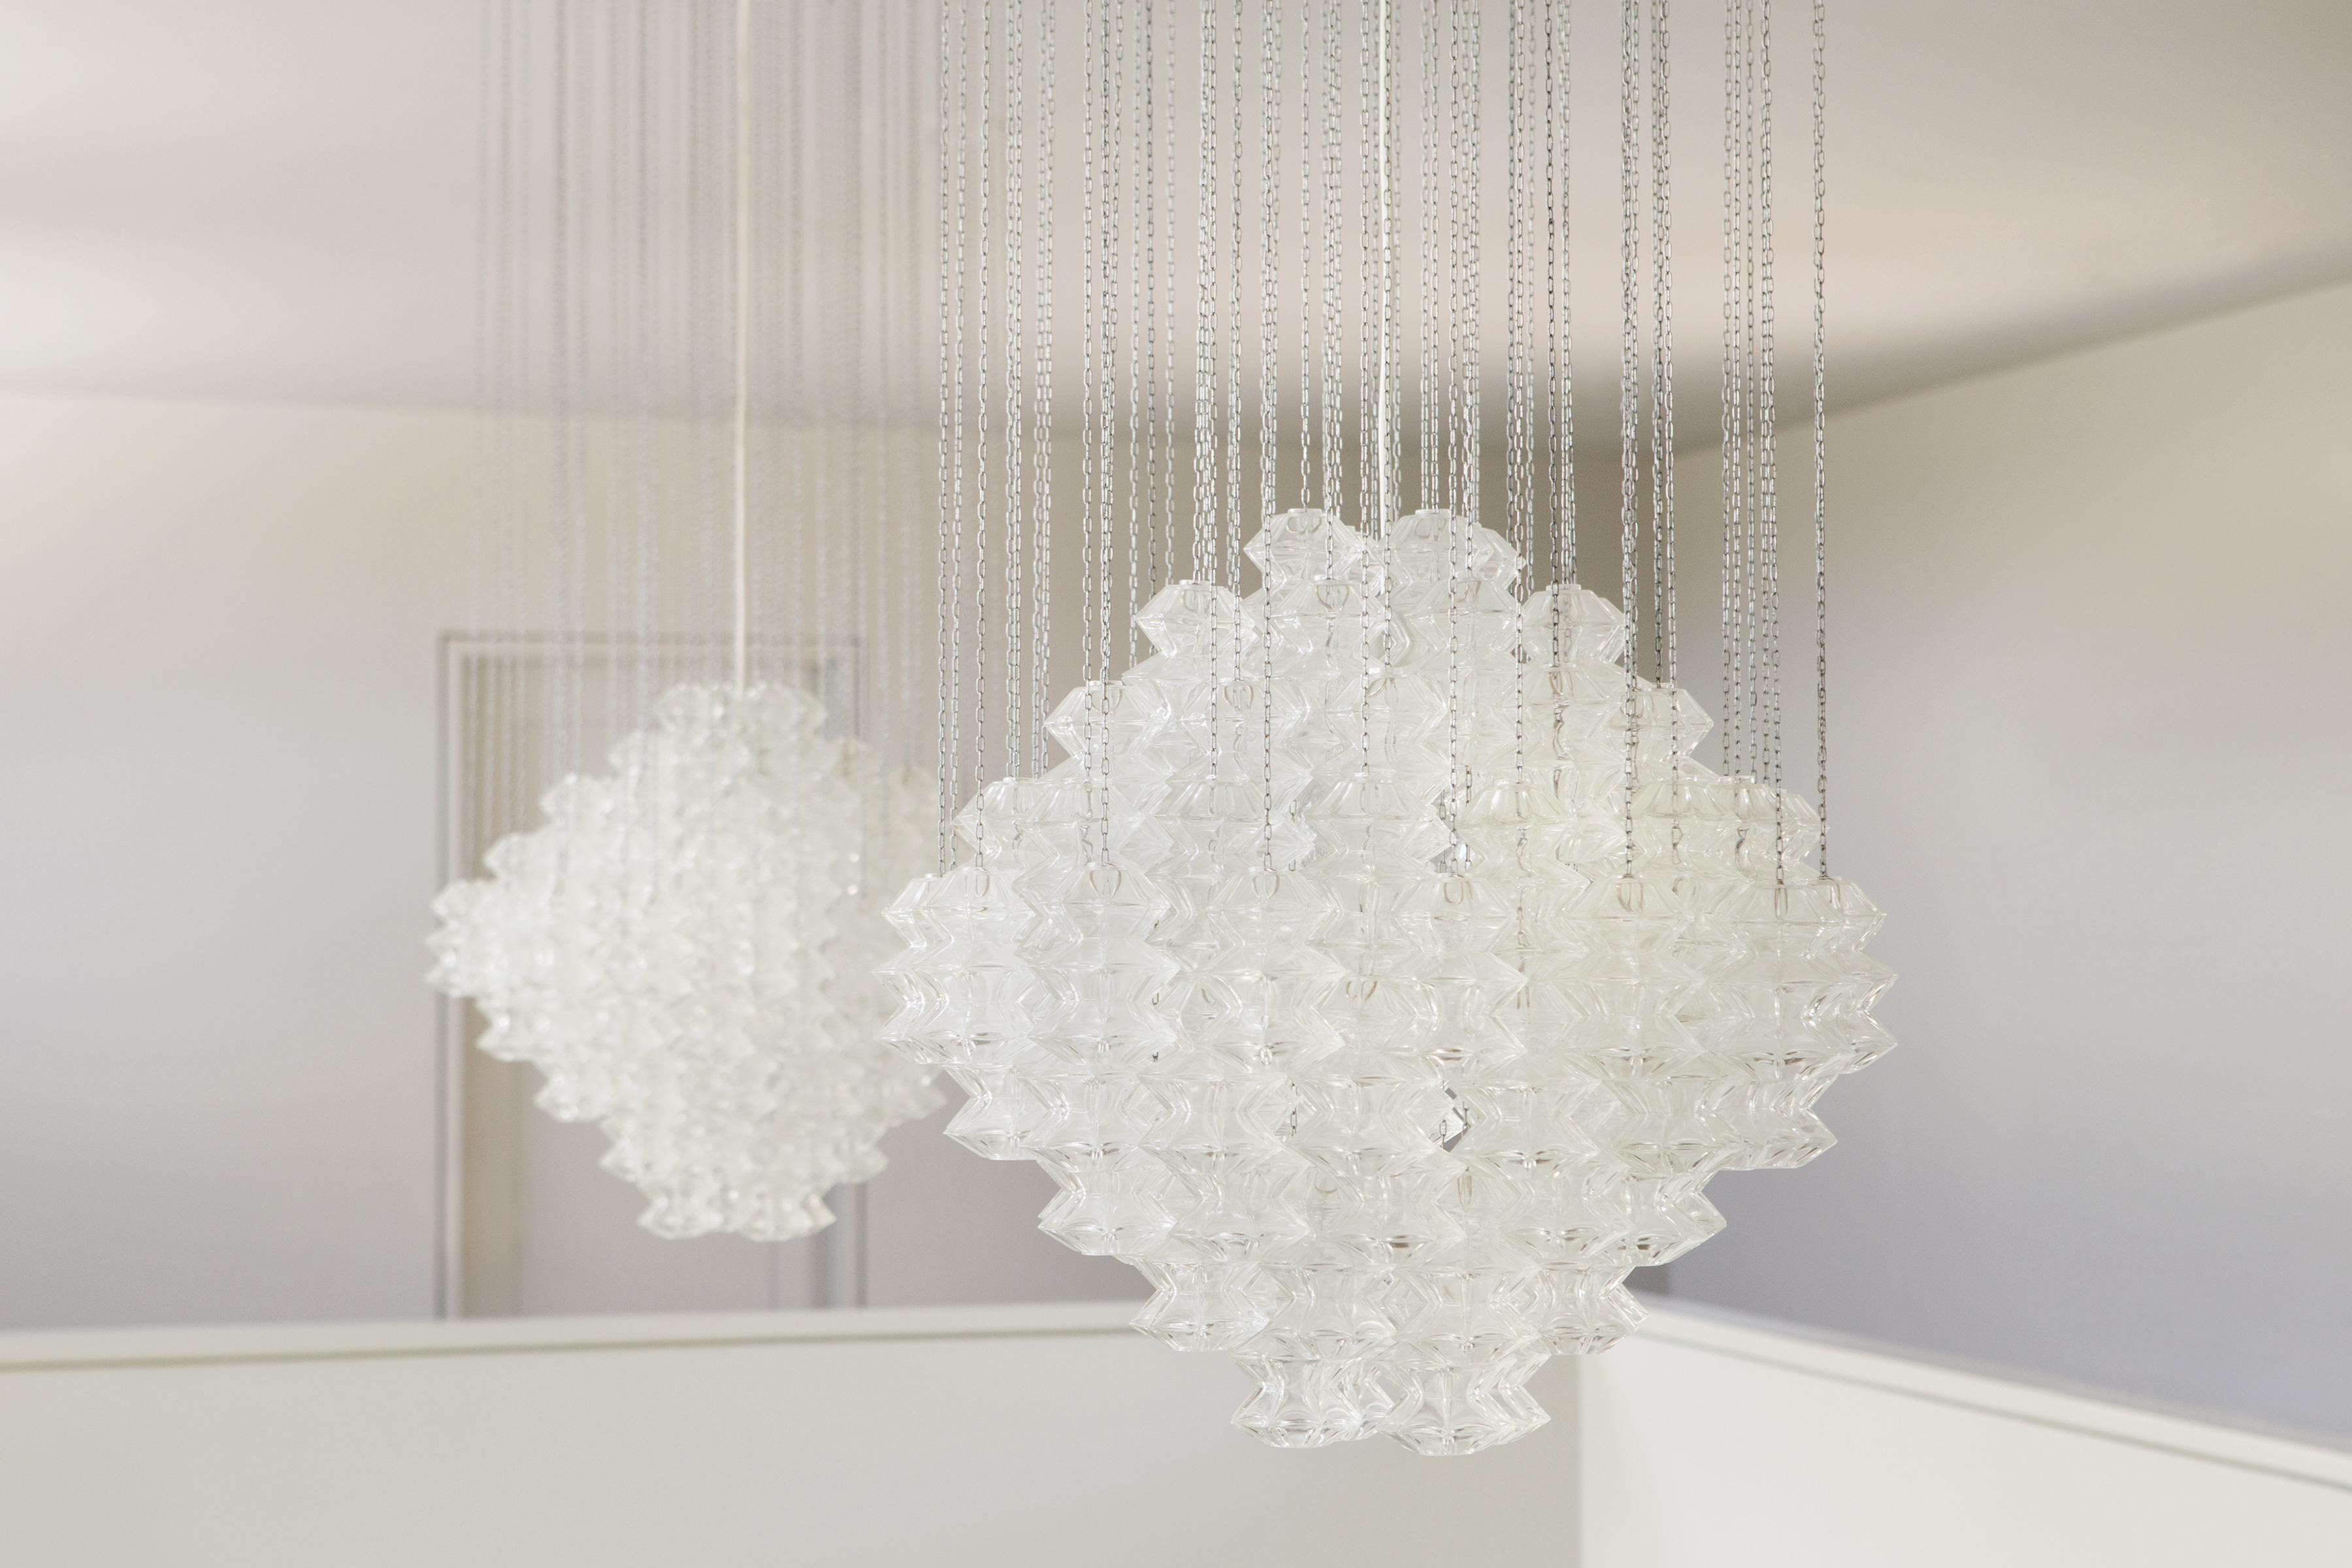 Lighting & Lighting | Product categories | Todd Merrill Studio azcodes.com